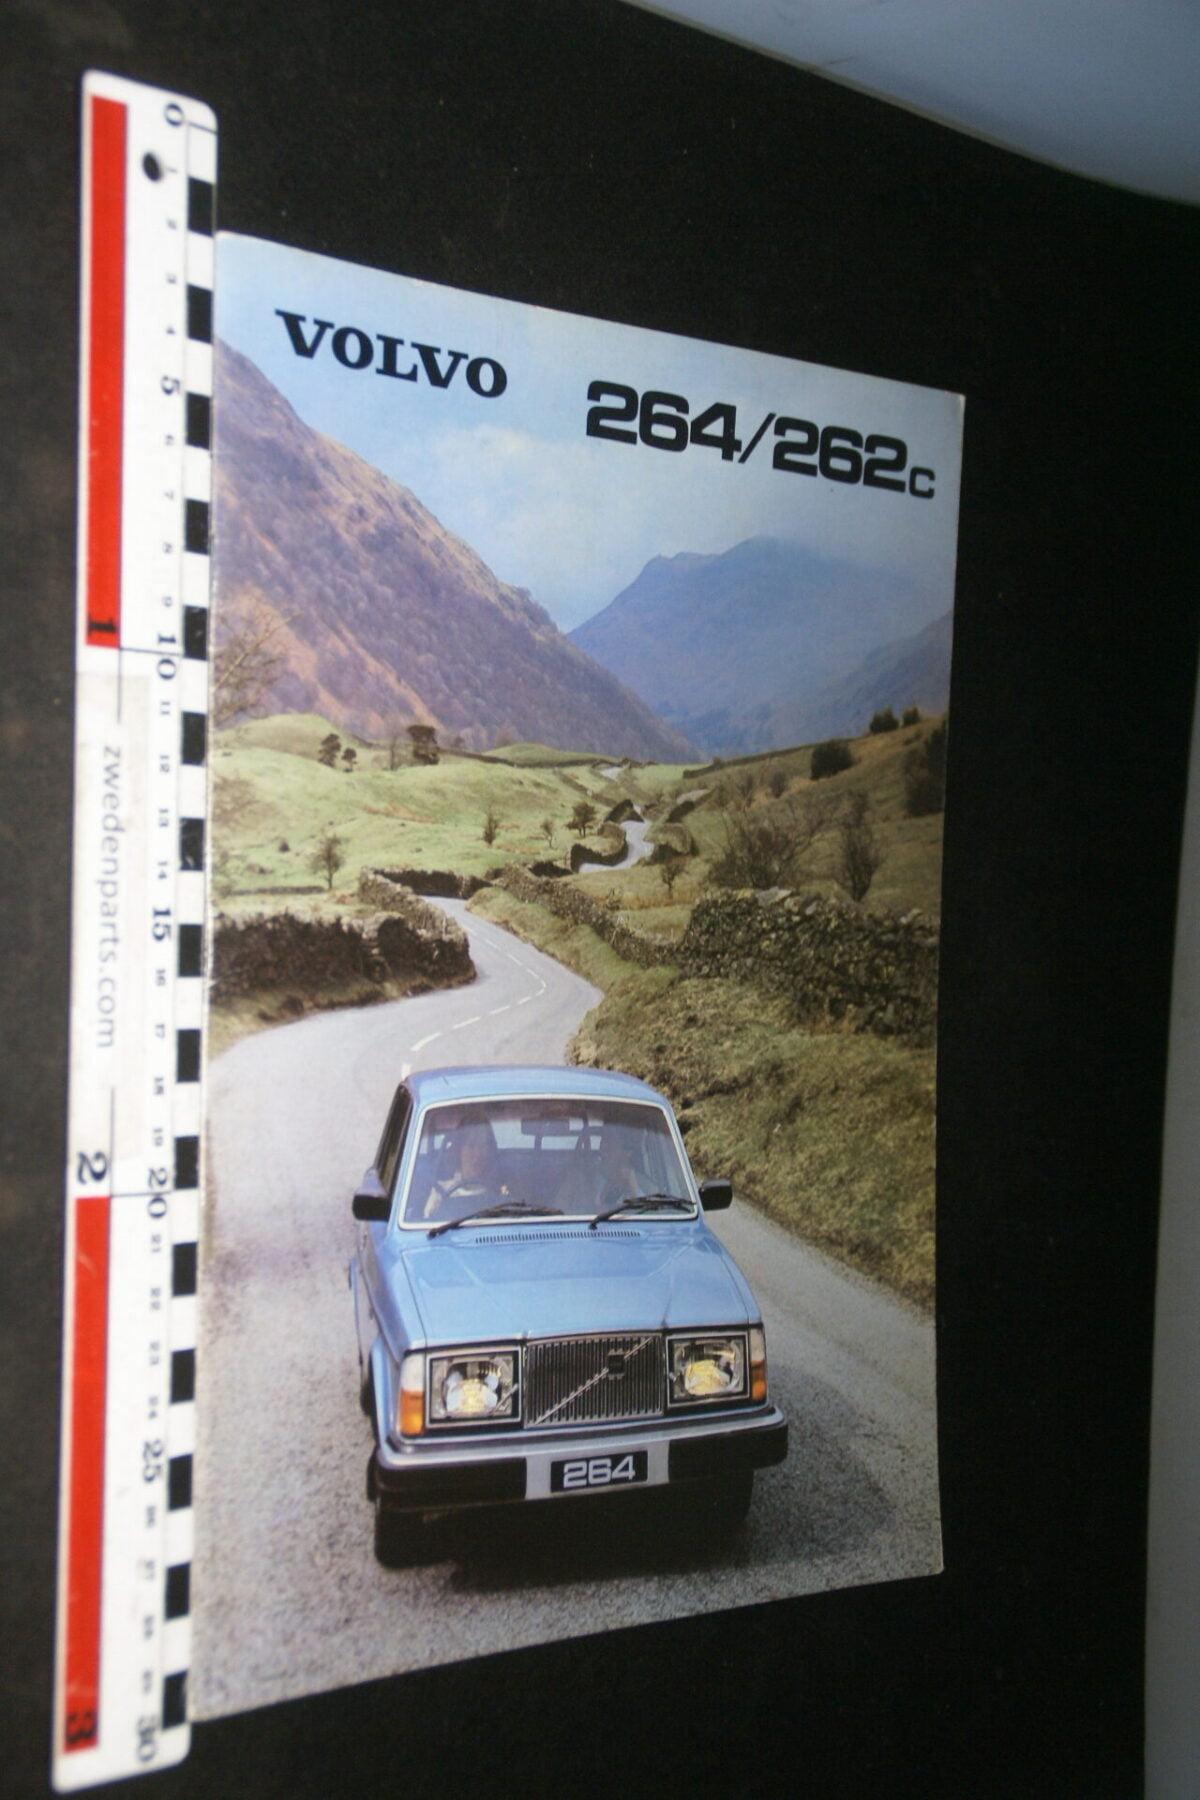 DSC07349 1980 originele Volvo 262C 264 brochure nr ASPPV 7563 English-60a3f3fb